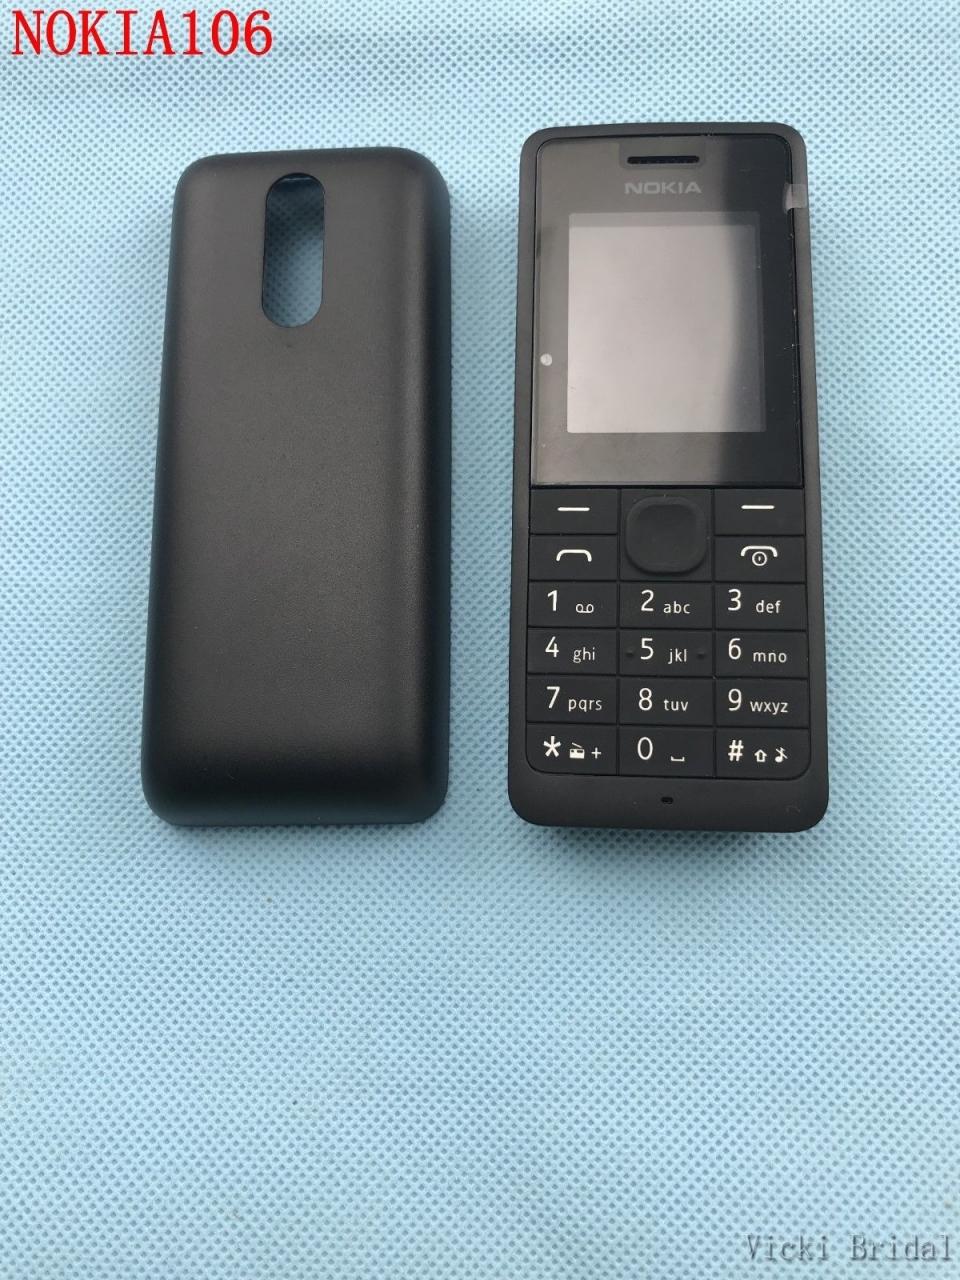 new Nokia 106 Unlocked Simple Mobile Phone Multiple keyboards languages white 14